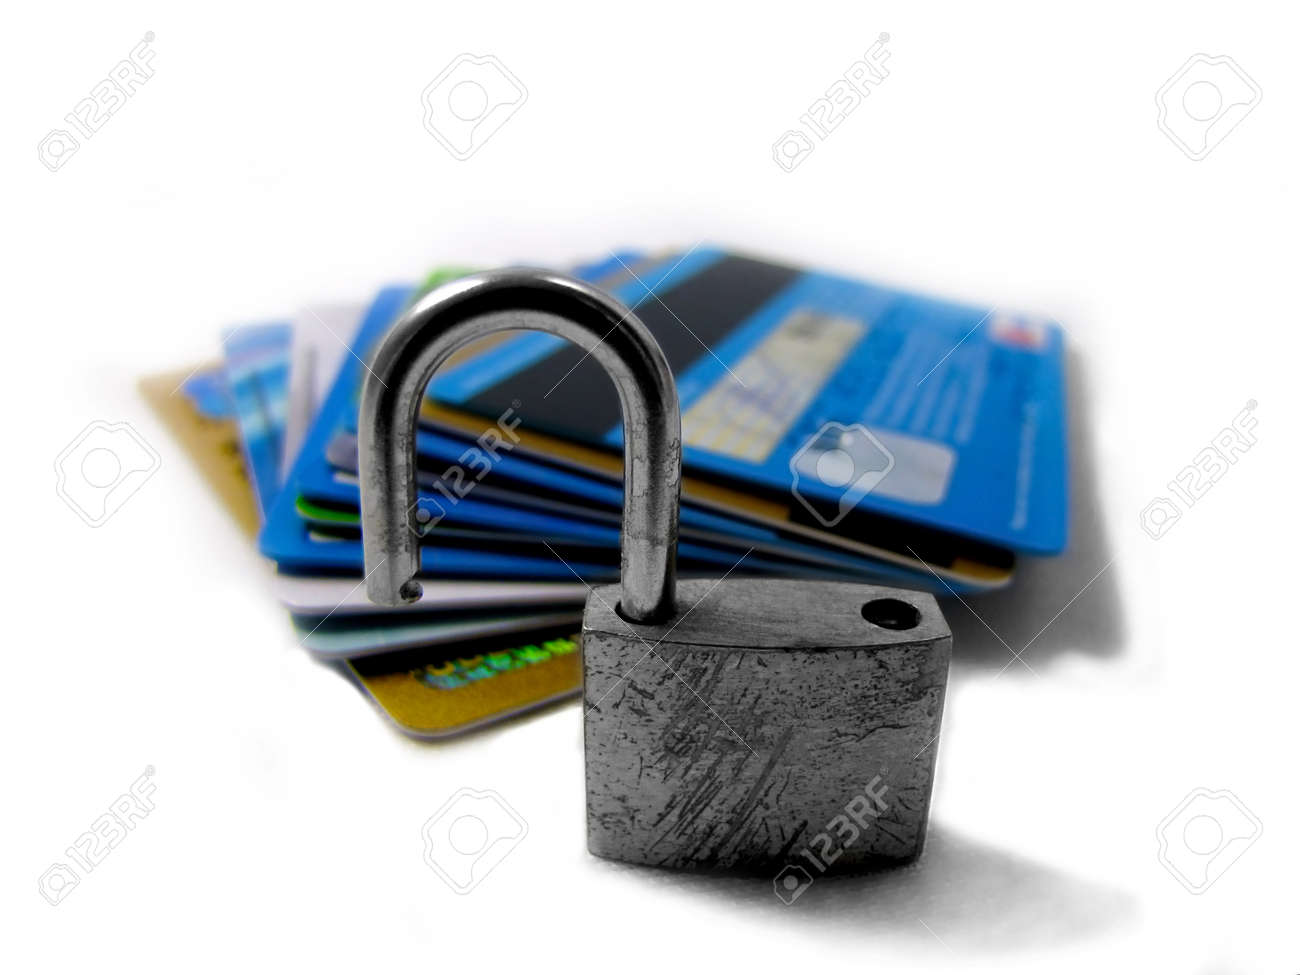 Unlocked and unsafe pin - identity theft Stock Photo - 17571190